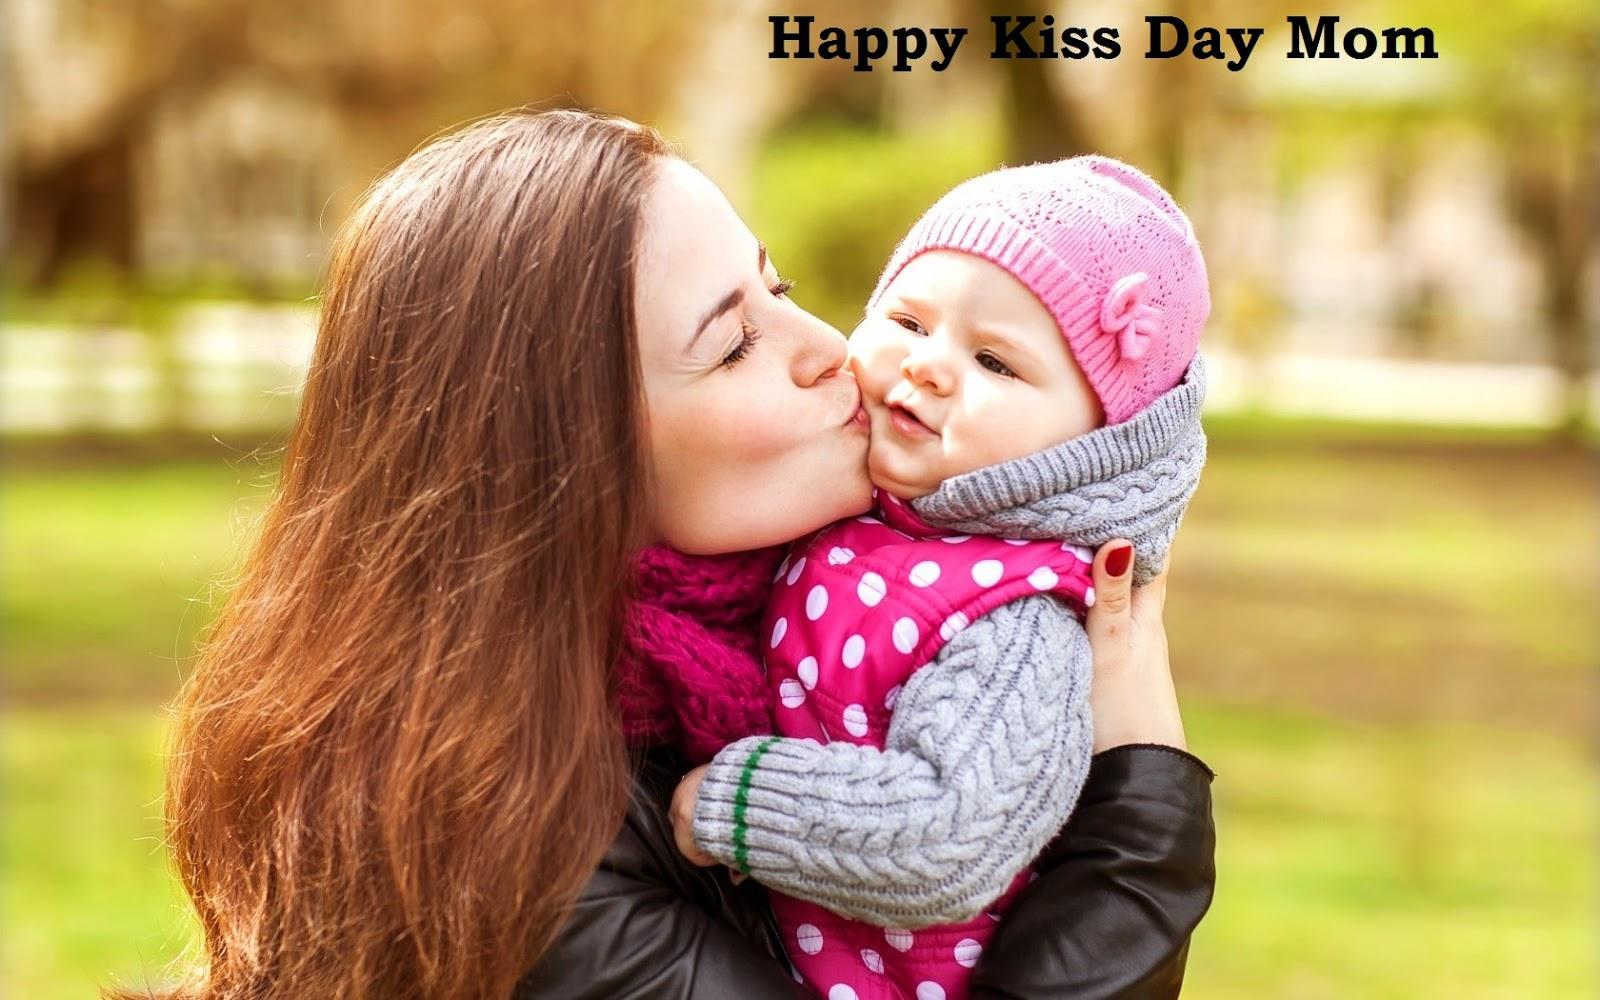 Advance Happy Kiss Day 2019 Whatsapp DP, Profile Pics